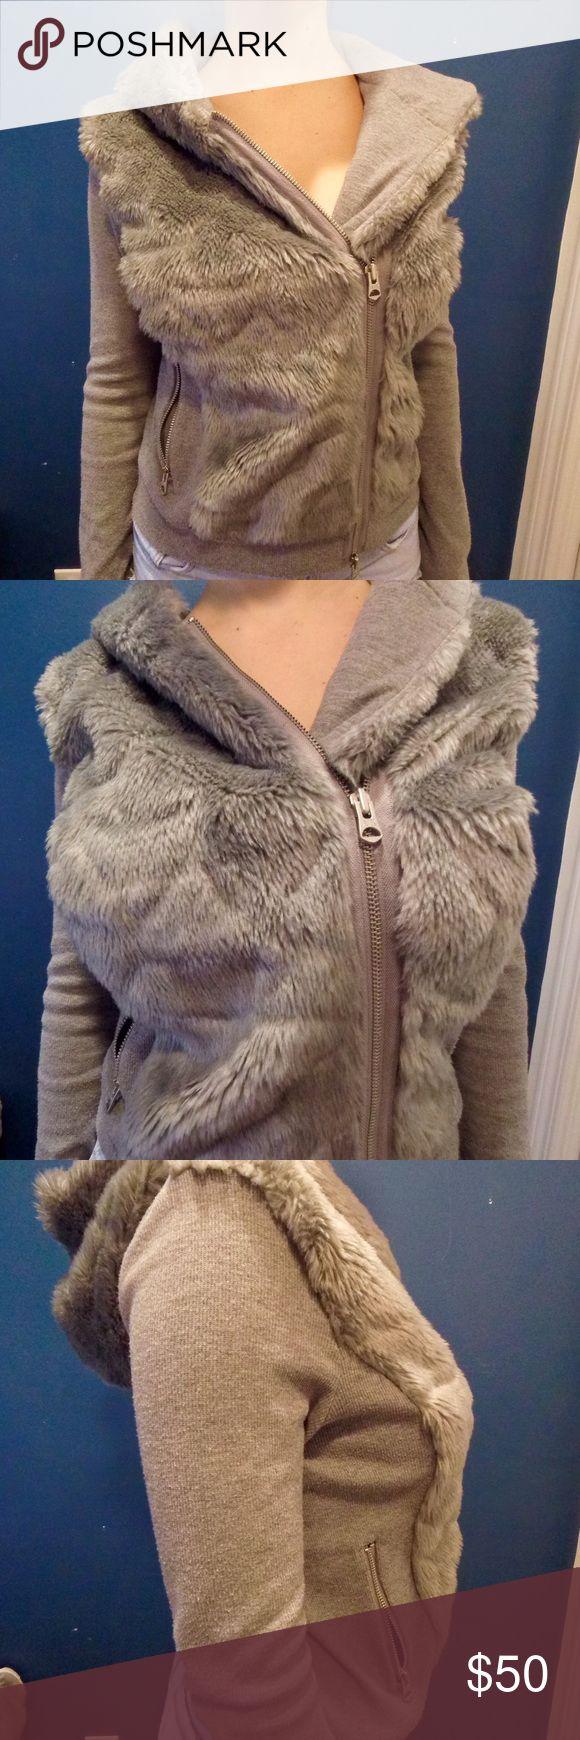 Spotted while shopping on Poshmark: Armani Exchange Fur Sweater! #poshmark #fashion #shopping #style #Armani Exchange #Sweaters